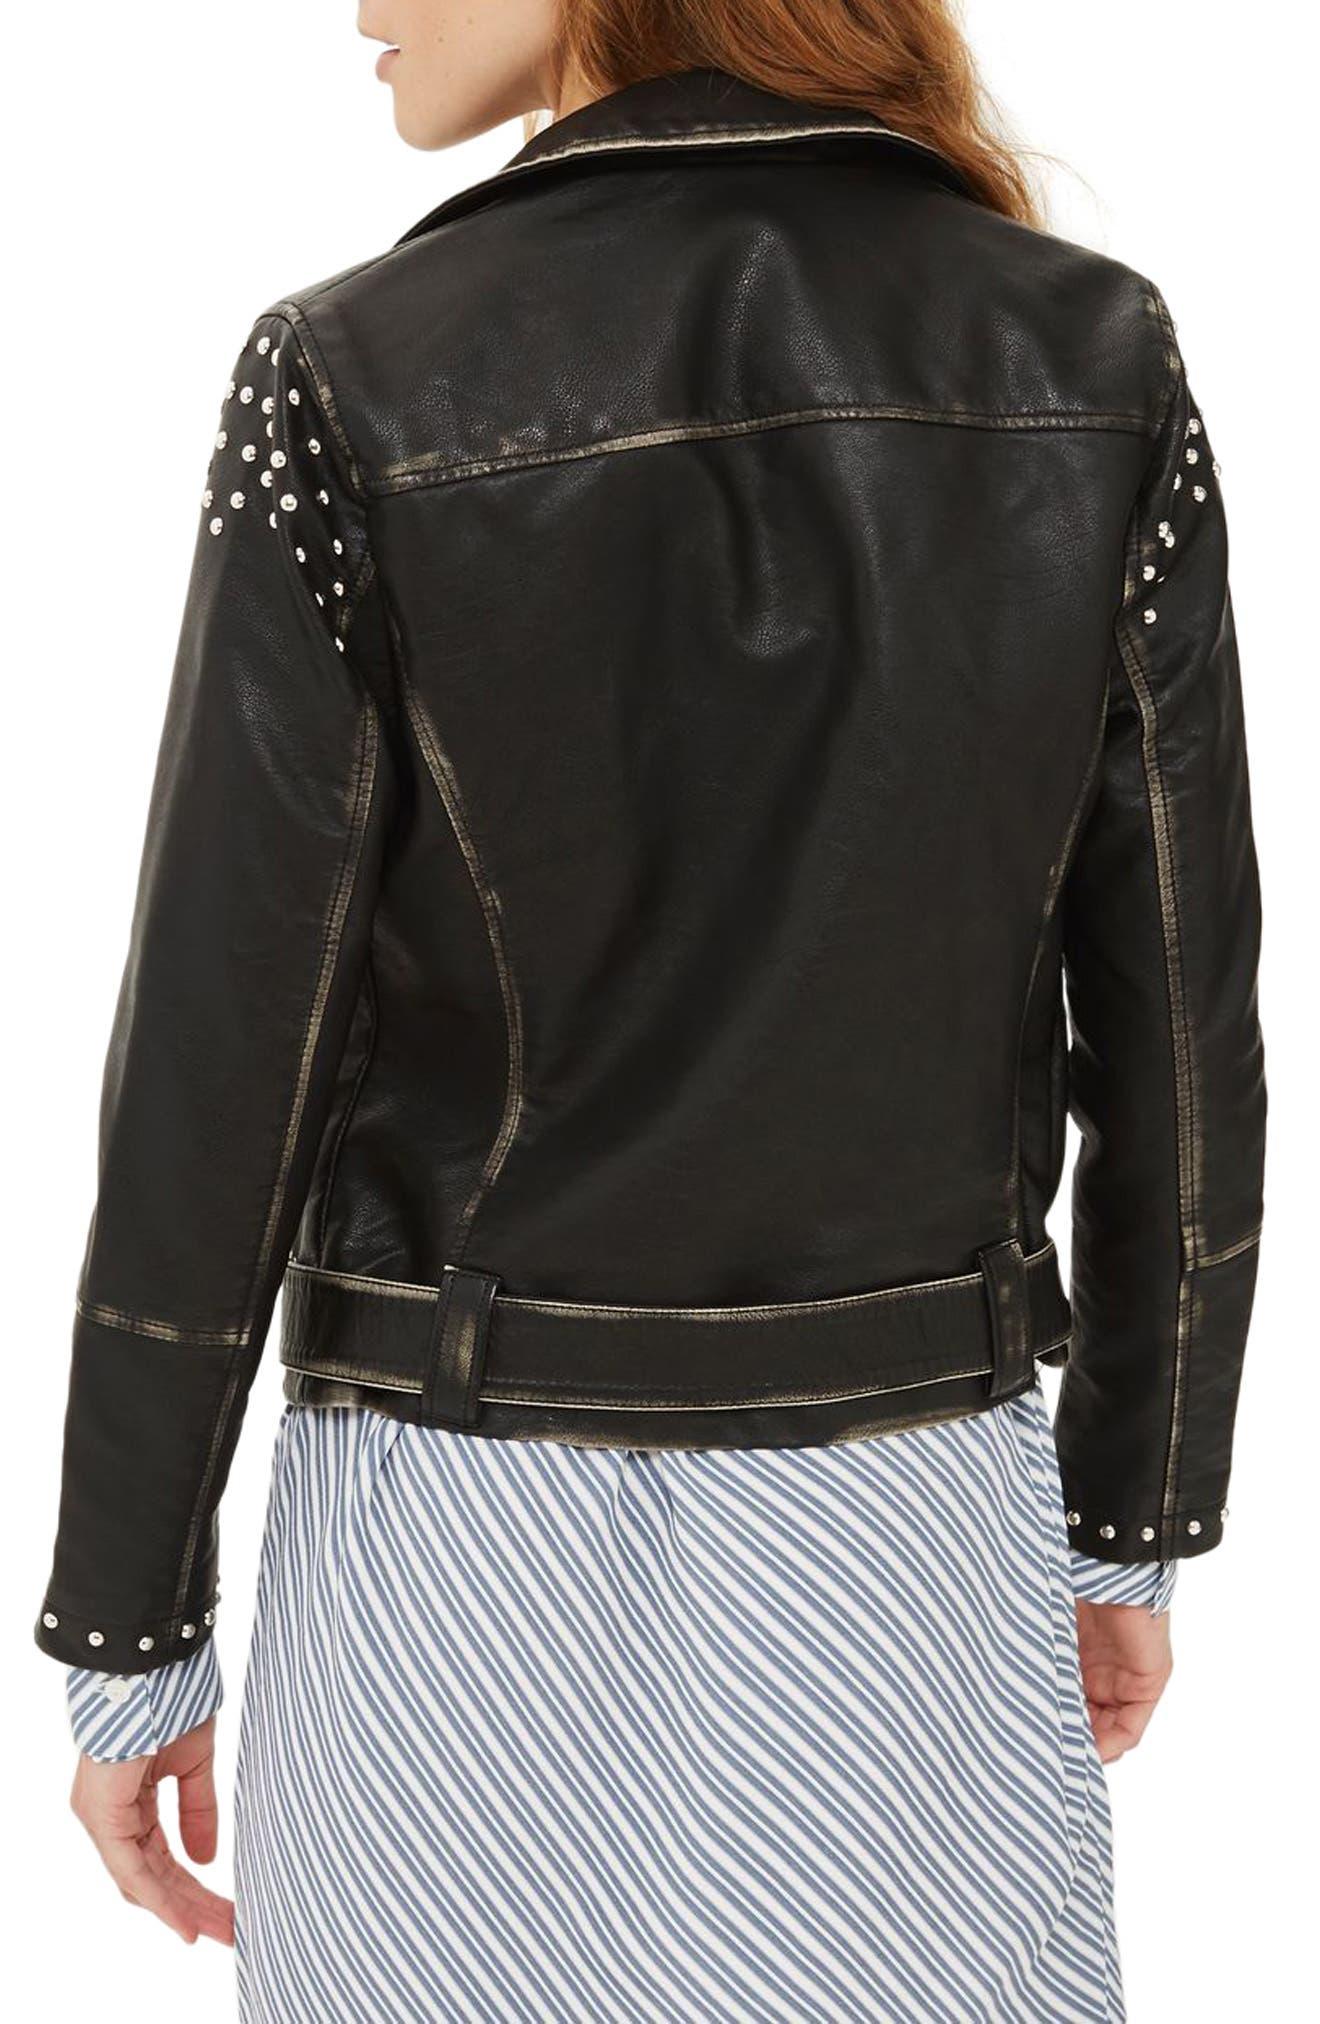 Naomi Studded Faux Leather Biker Jacket,                             Alternate thumbnail 2, color,                             001